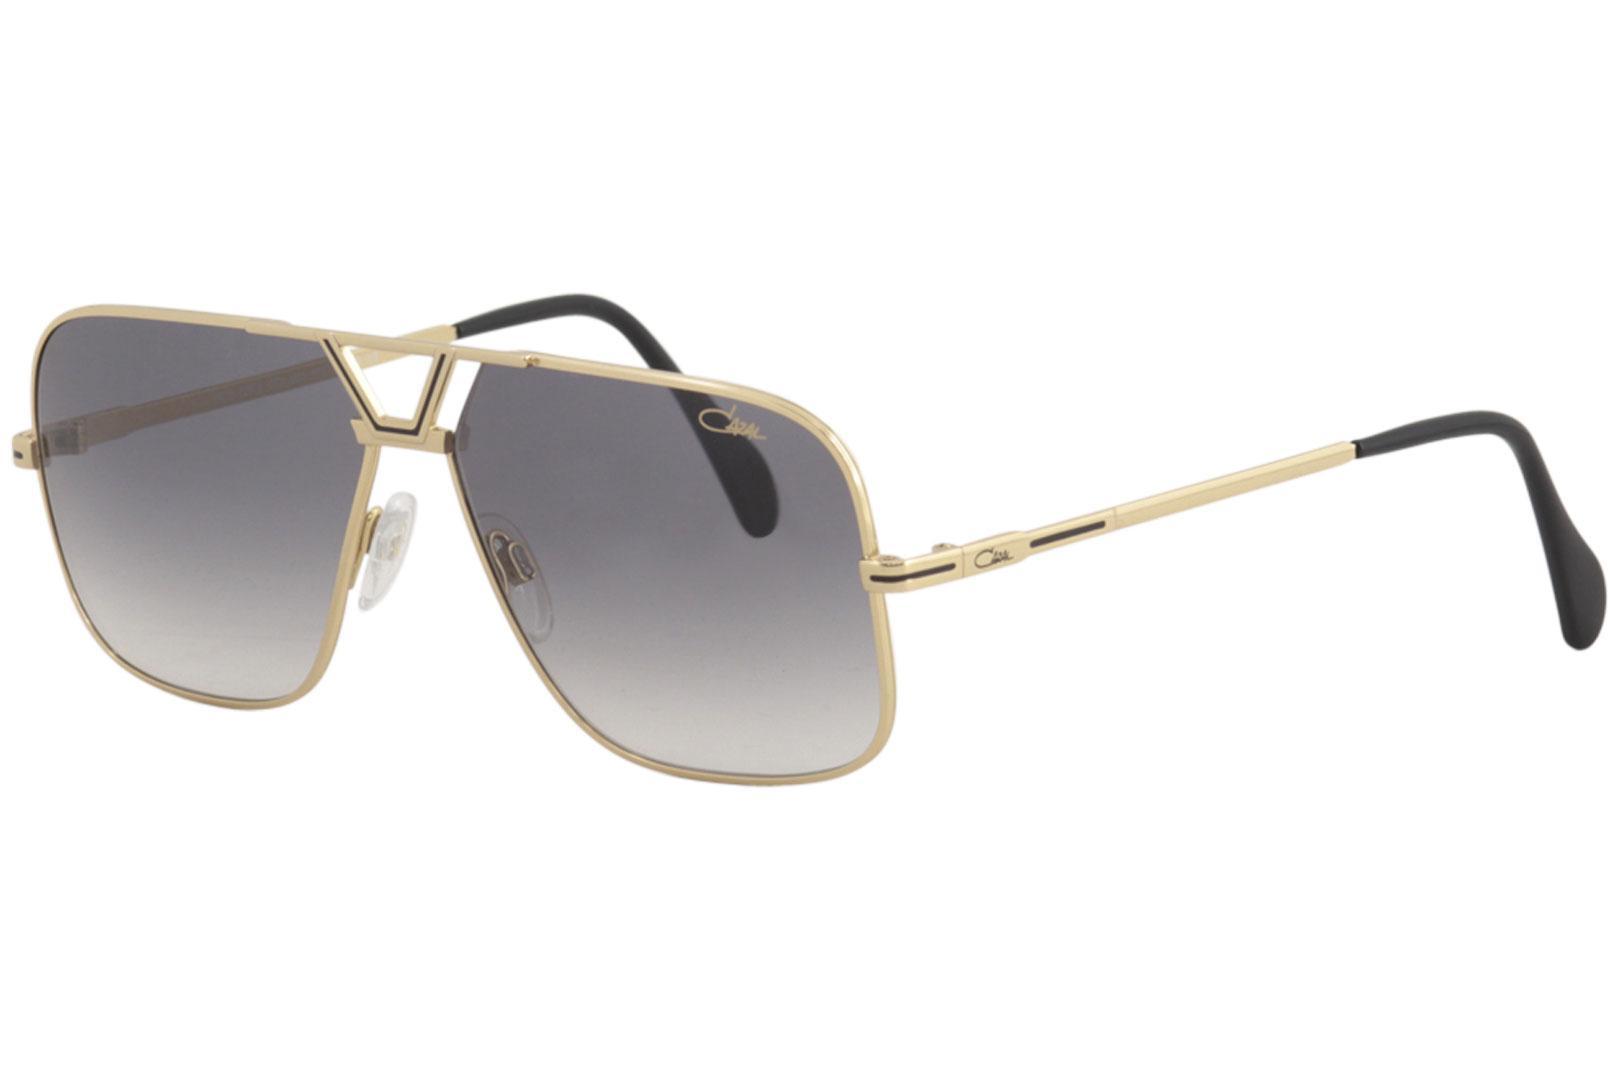 34ccec1091 Cazal Legends Men s 725 Retro Pilot Sunglasses